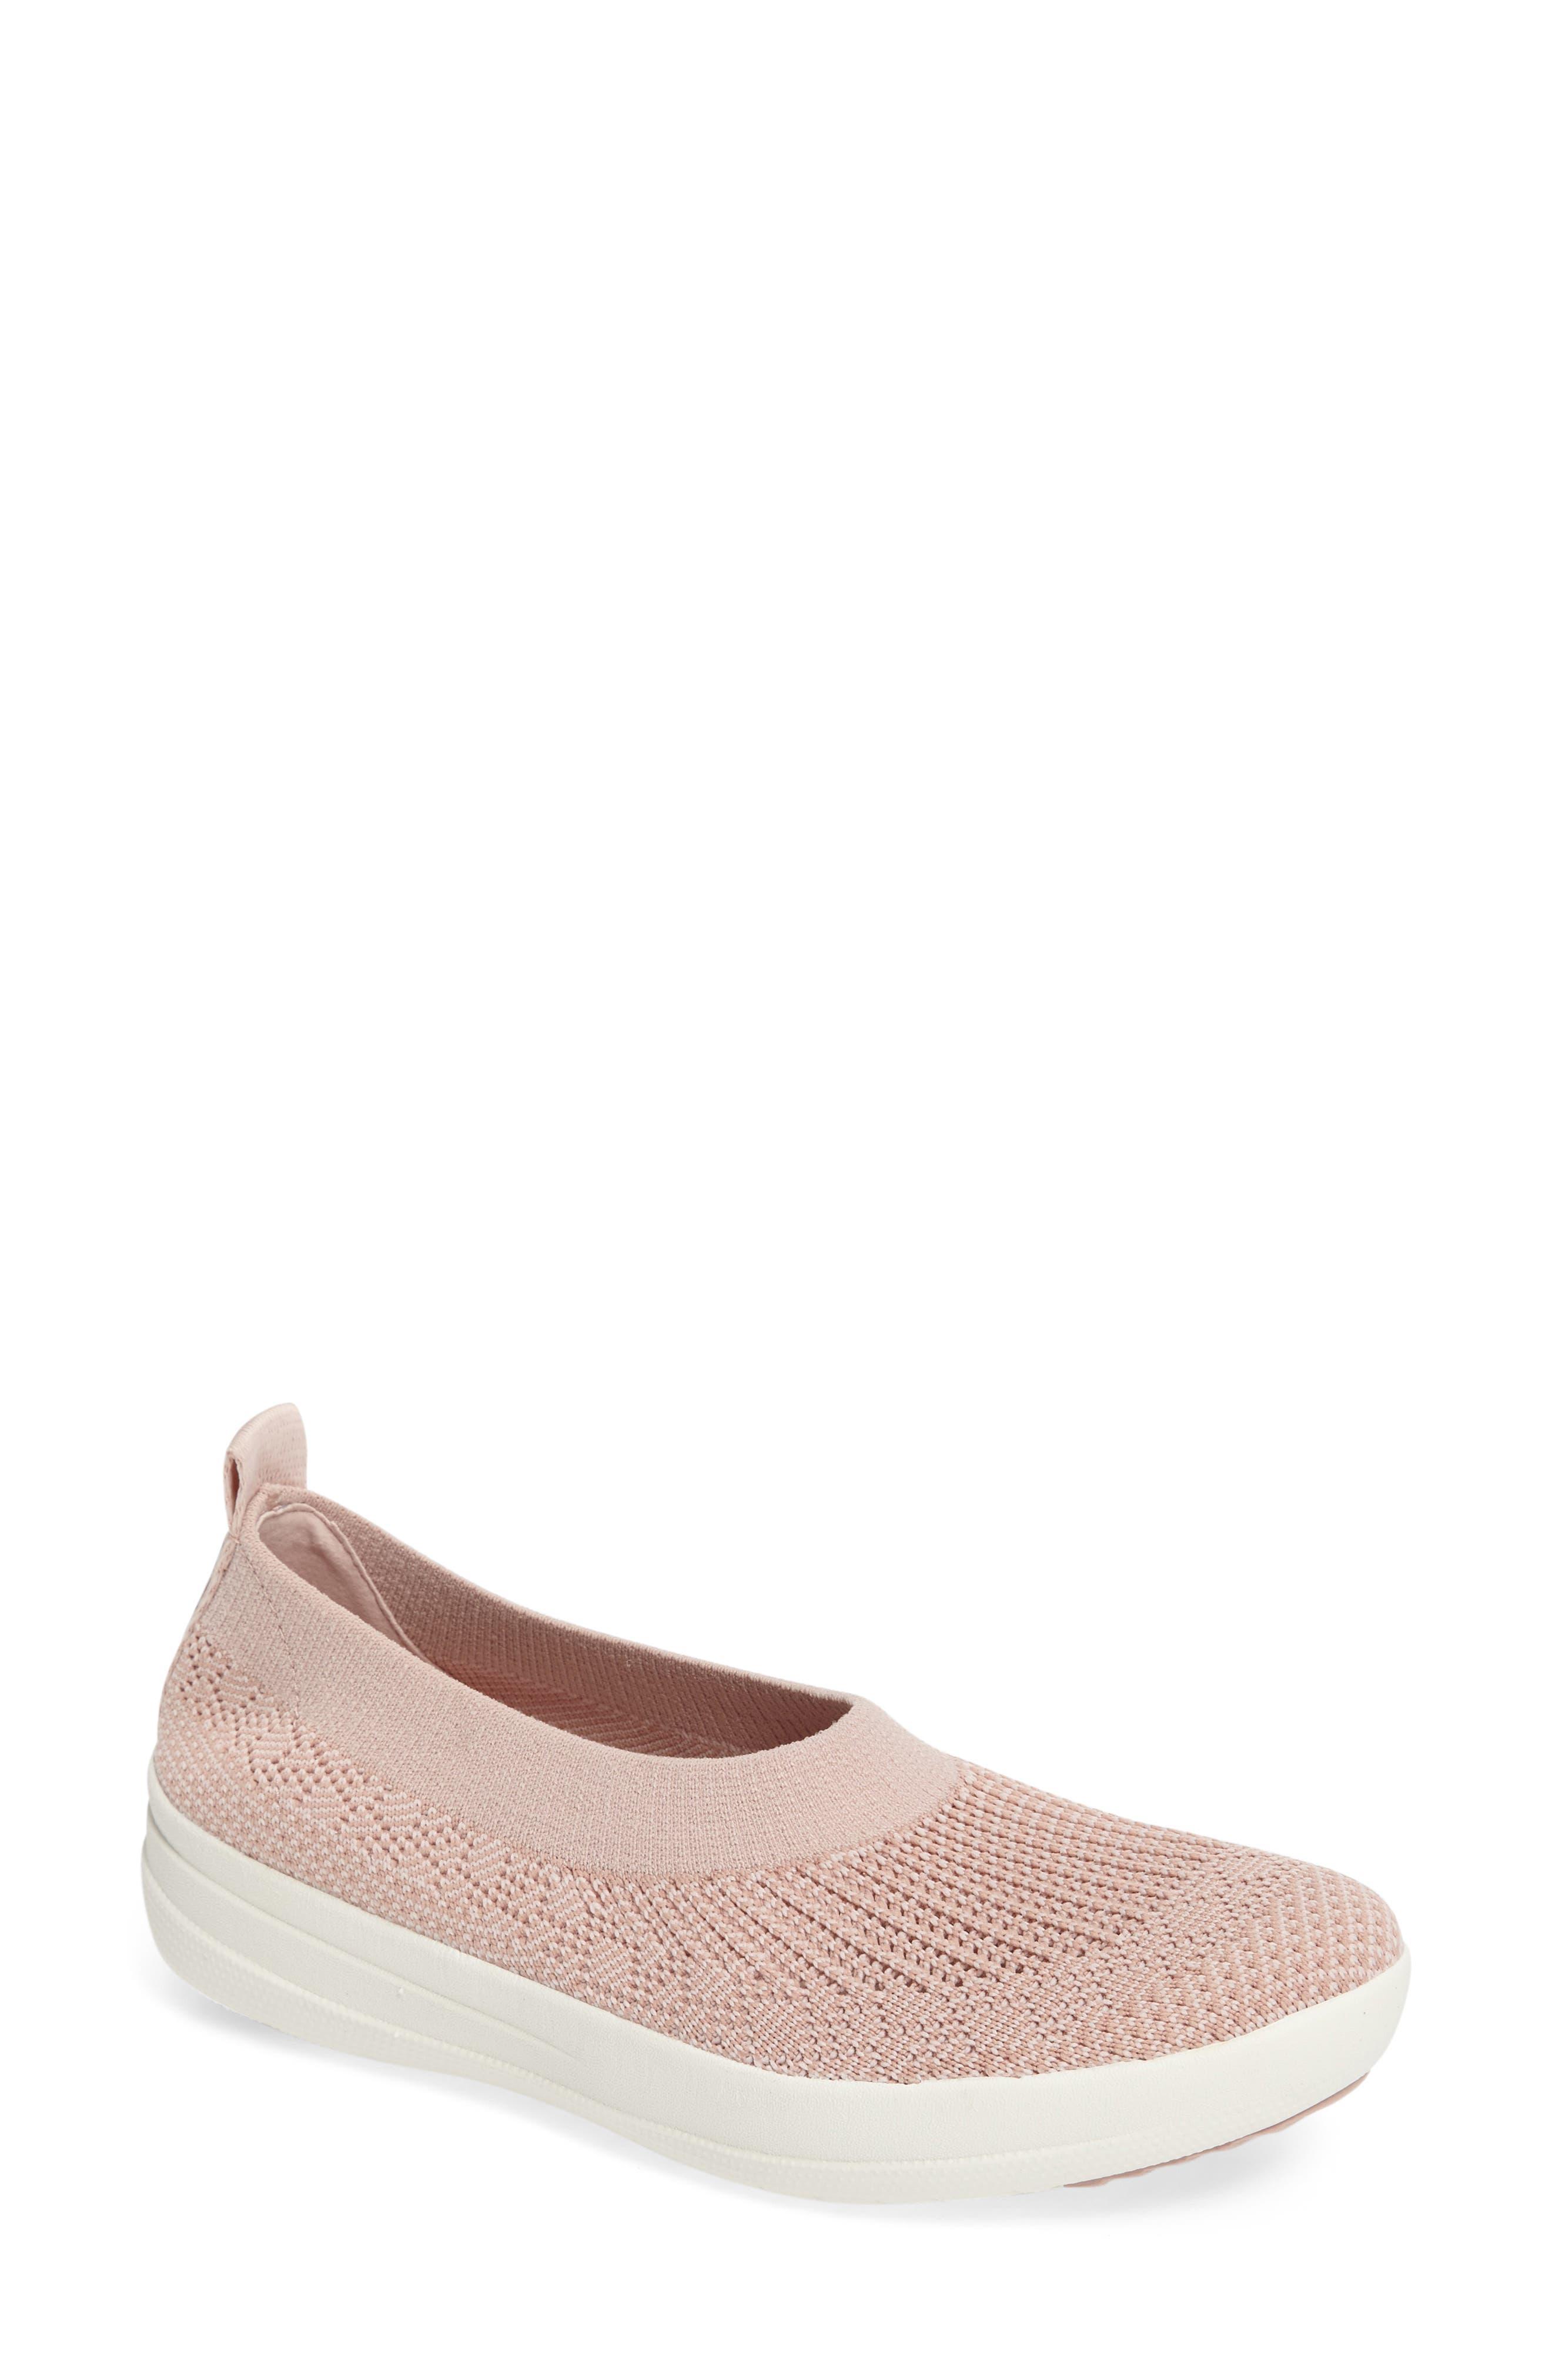 Alternate Image 1 Selected - FitFlop Uberknit Slip-On Sneaker (Women)